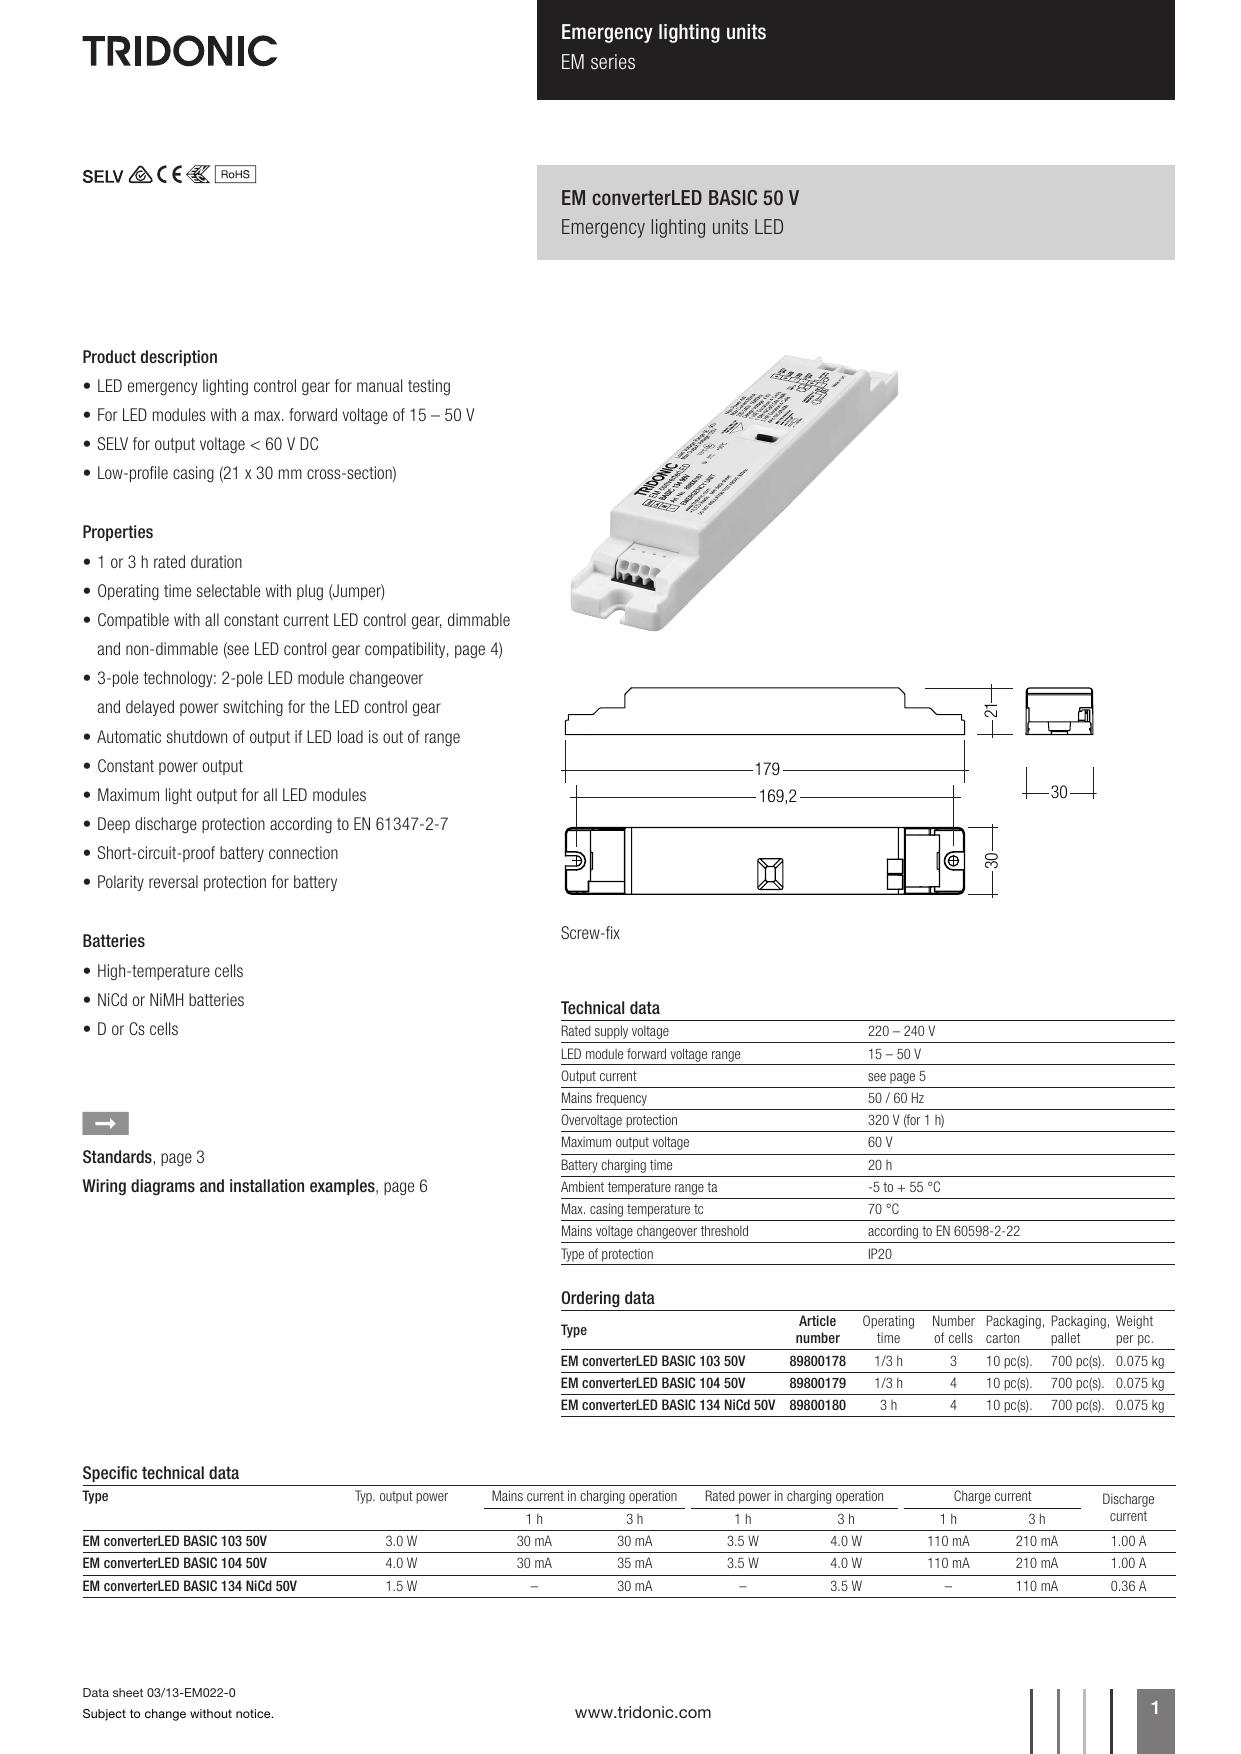 Box of 10 Tridonic EM Converter LED Pro 104 50v